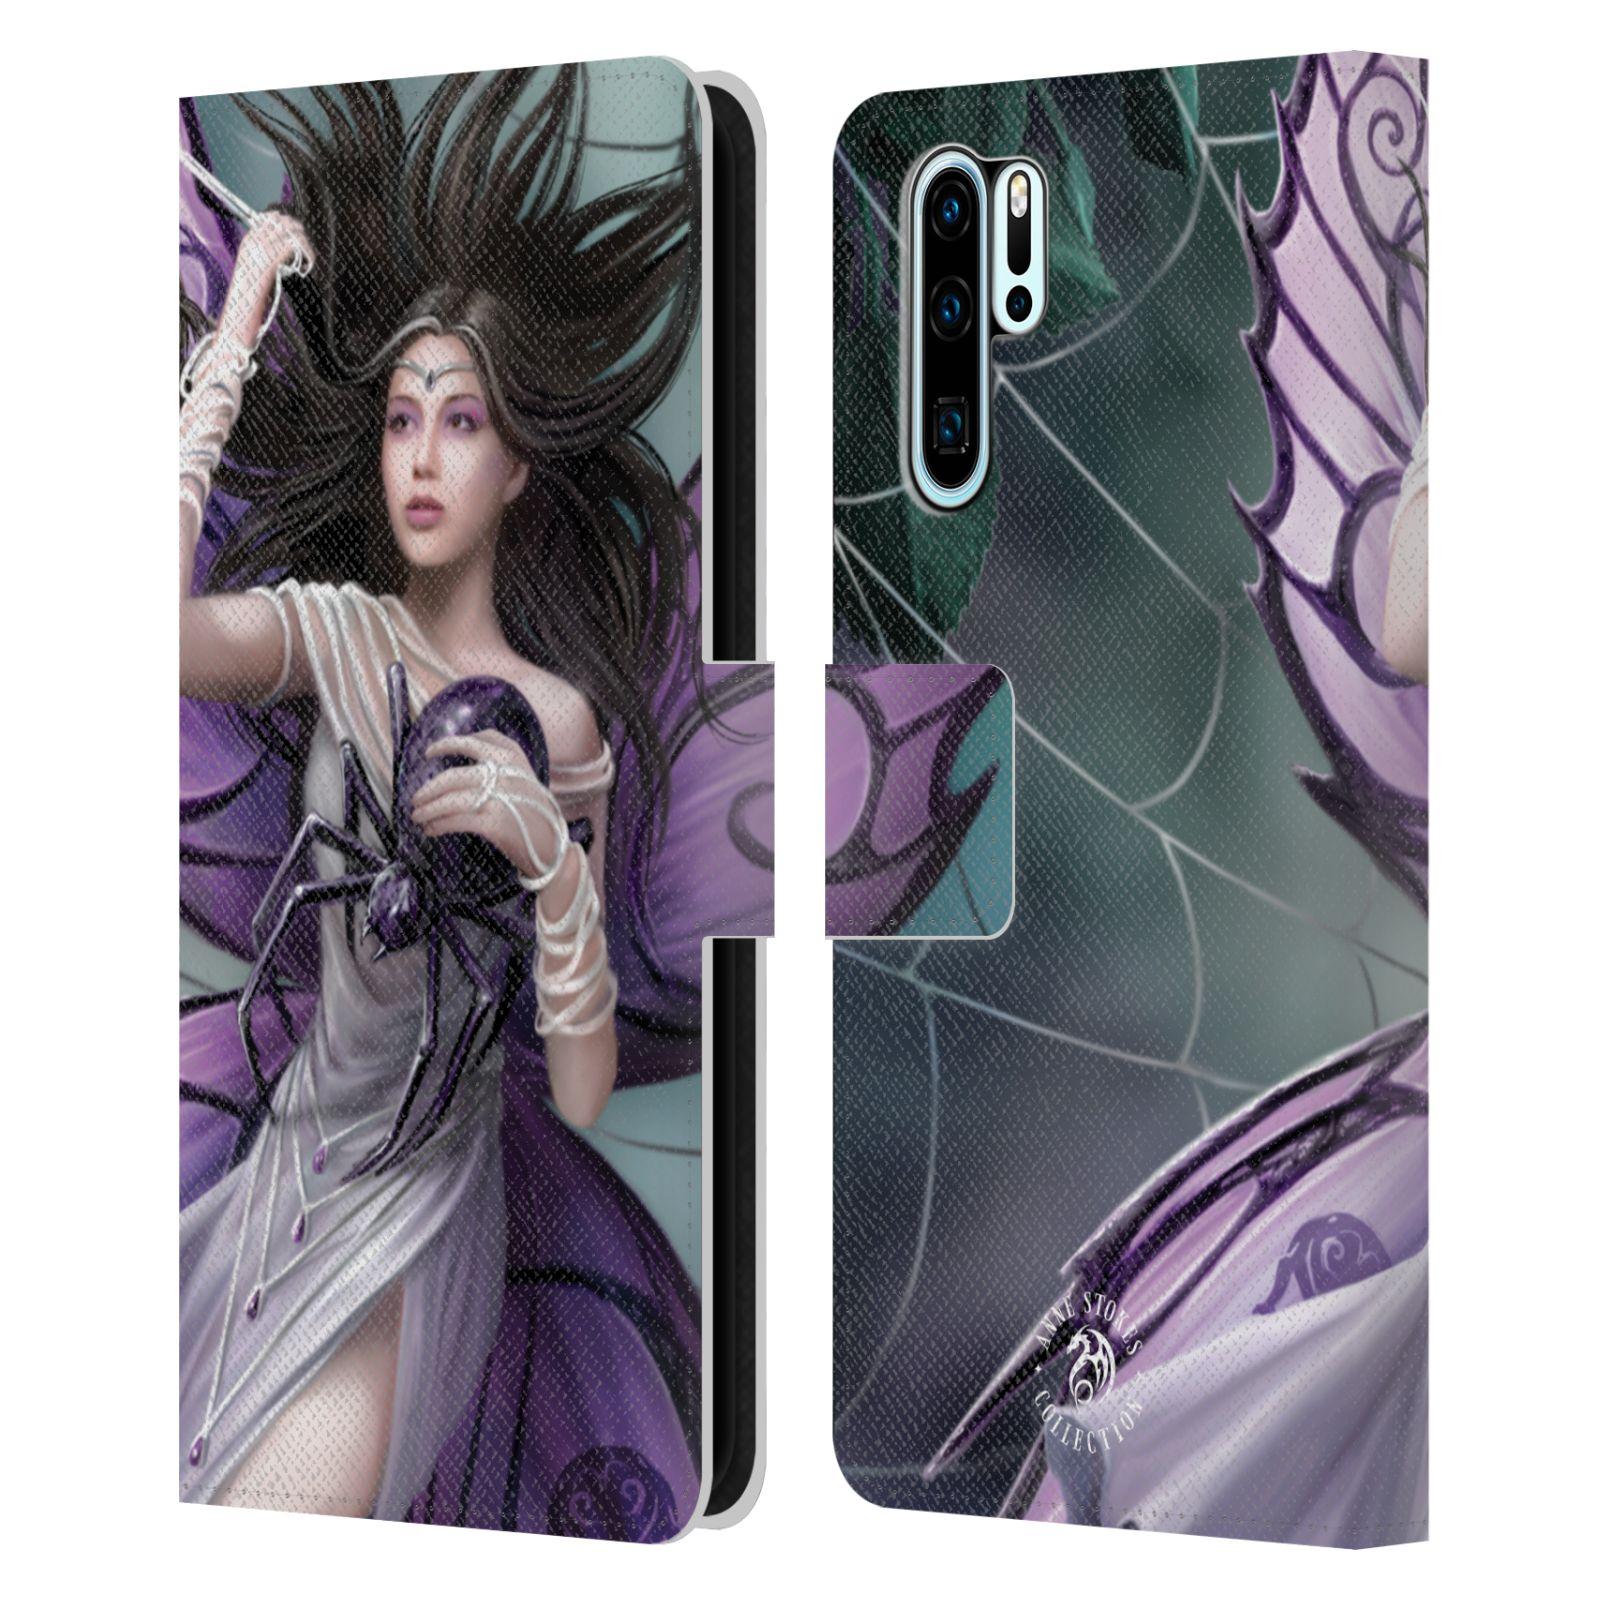 Pouzdro na mobil Huawei P30 PRO - Head Case - fantasy - žena svůdnice